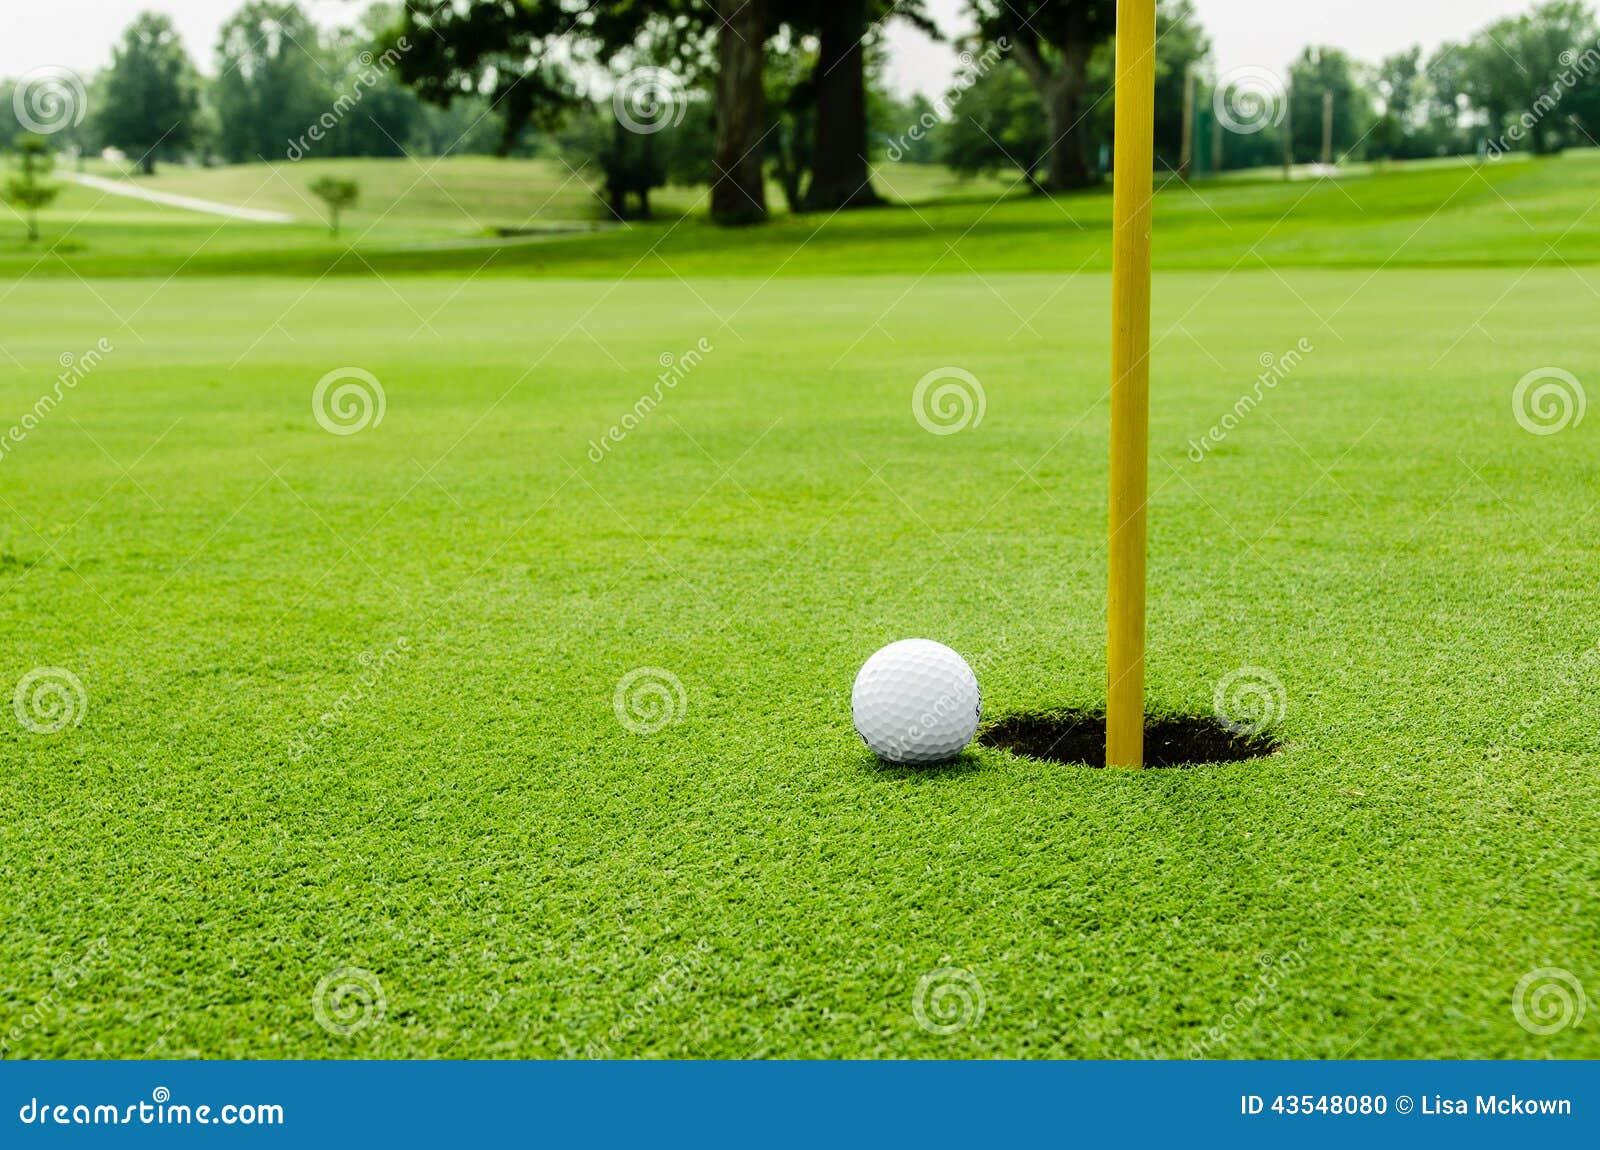 golf ball royalty free stock image. Black Bedroom Furniture Sets. Home Design Ideas